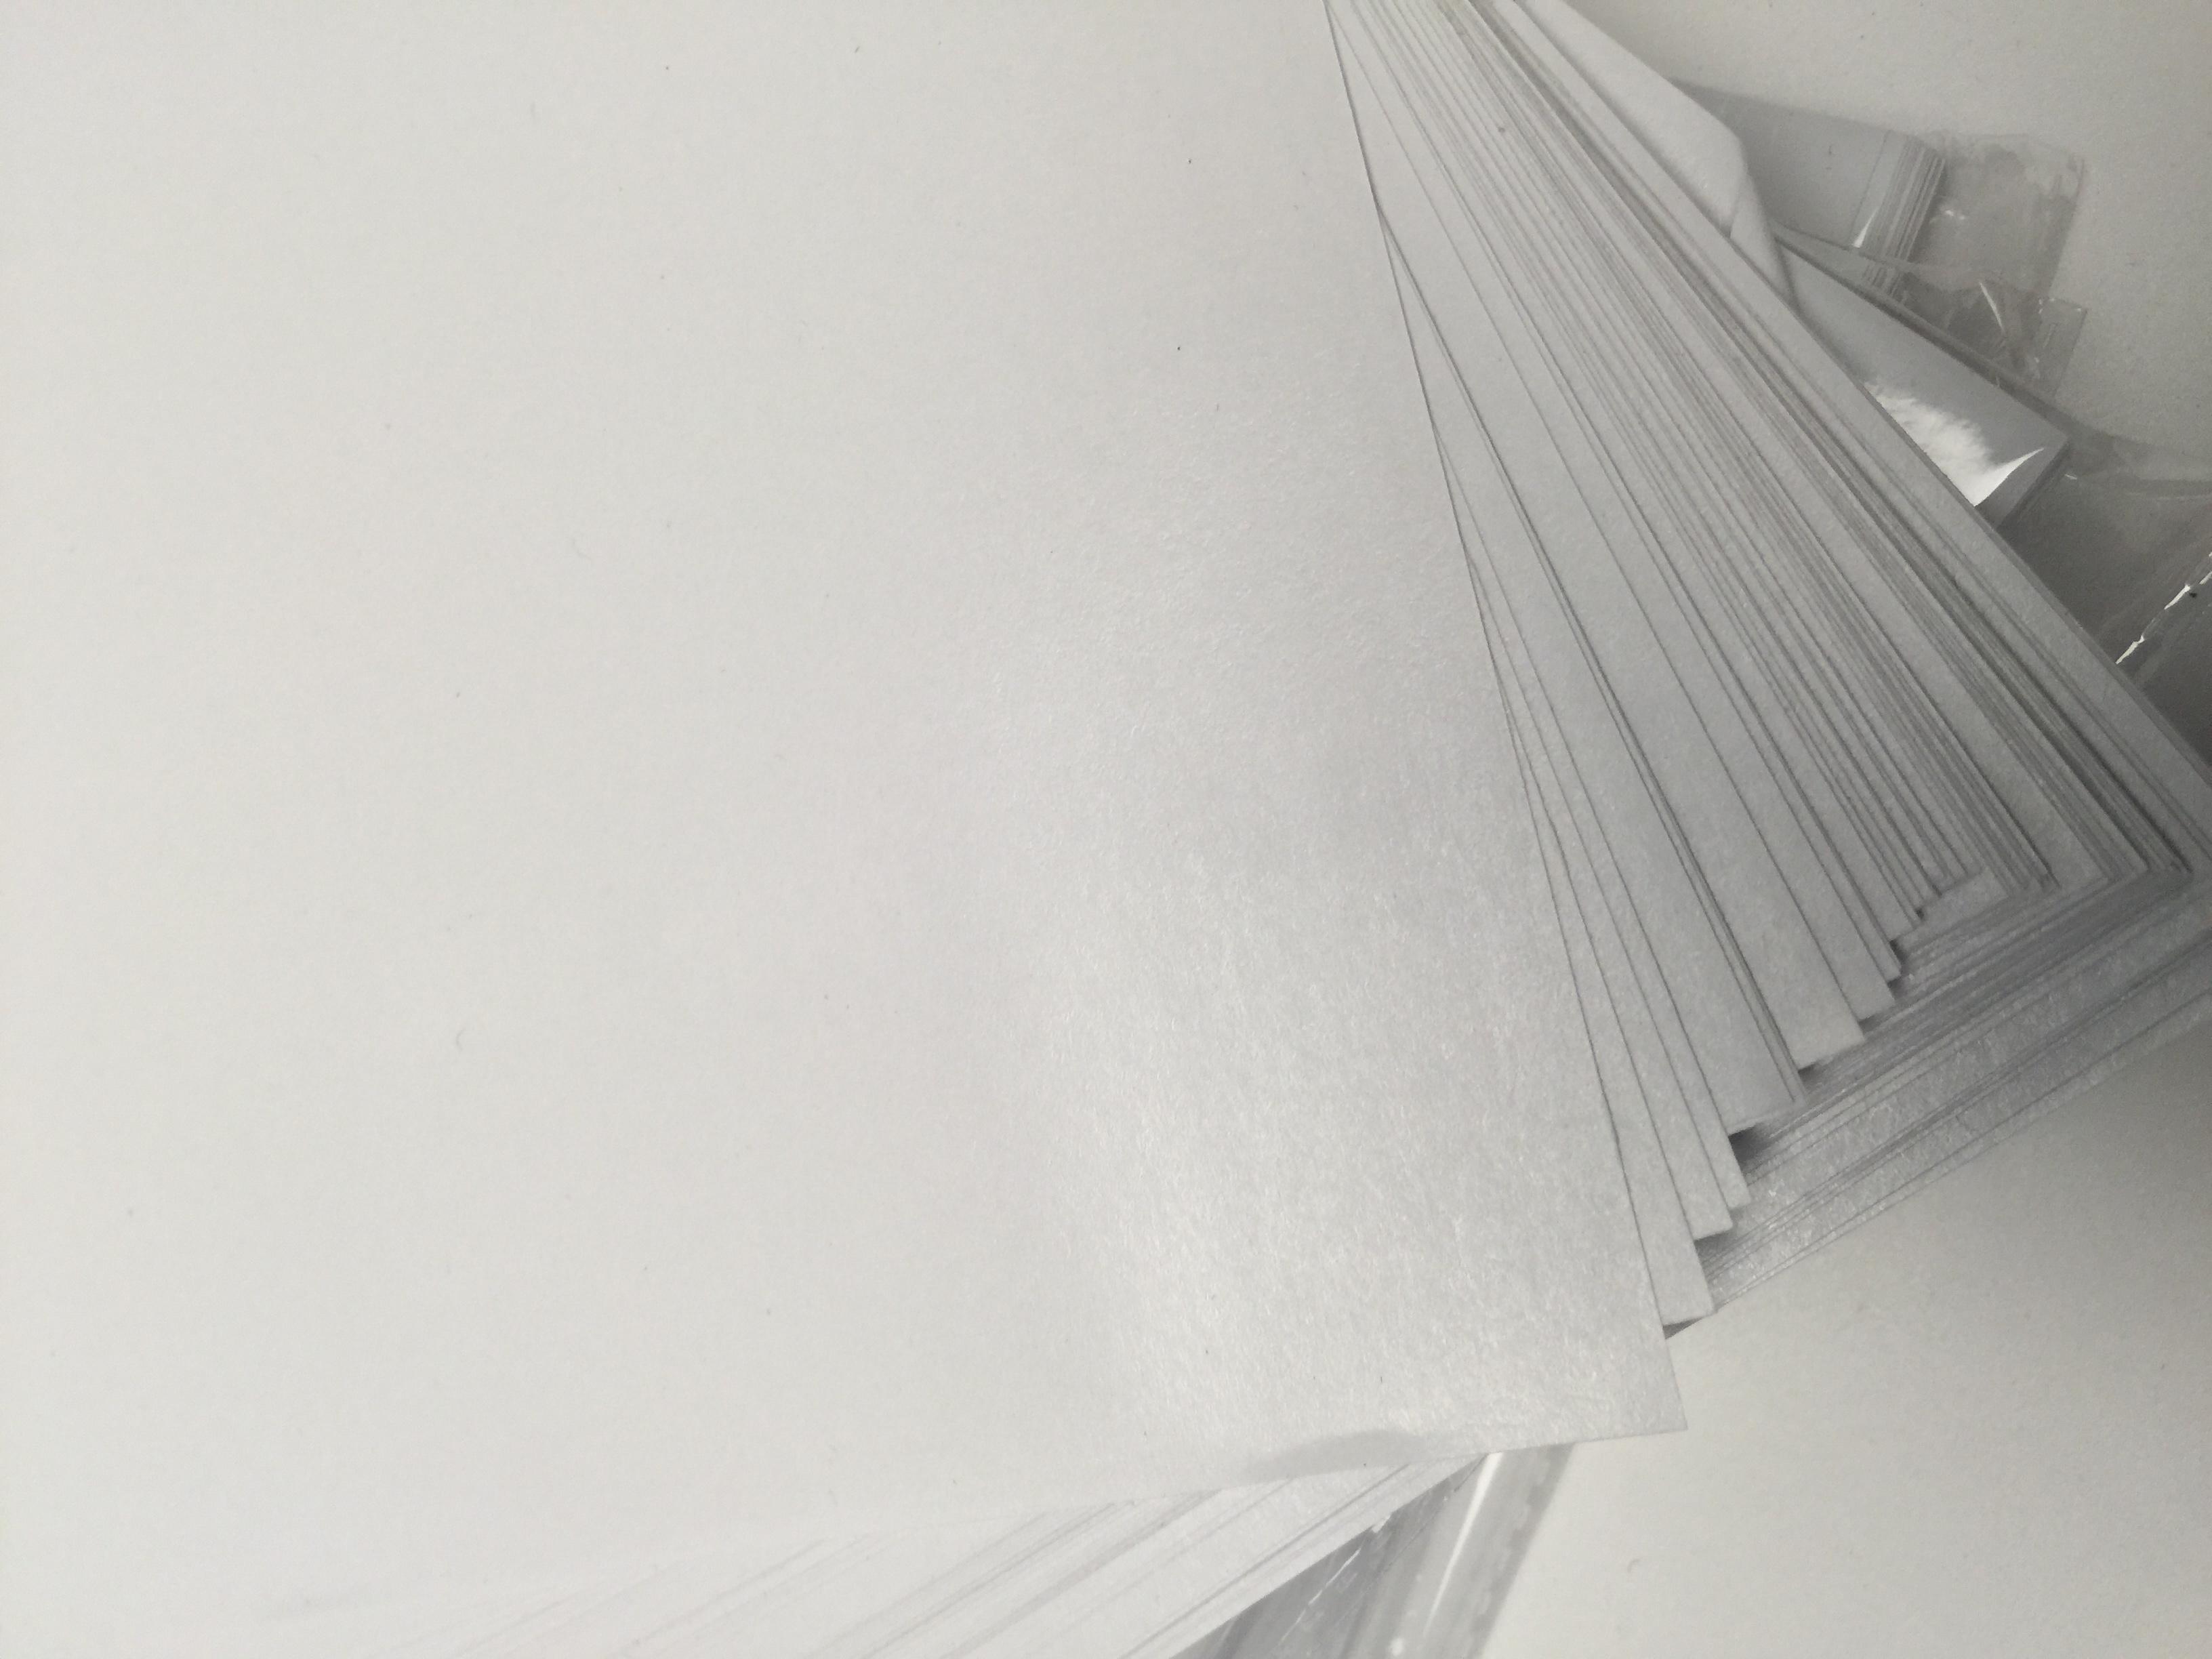 a4A4隔离纸不干胶硅油纸剪纸贴手粘胶带diy手帐100张防粘纸离型纸